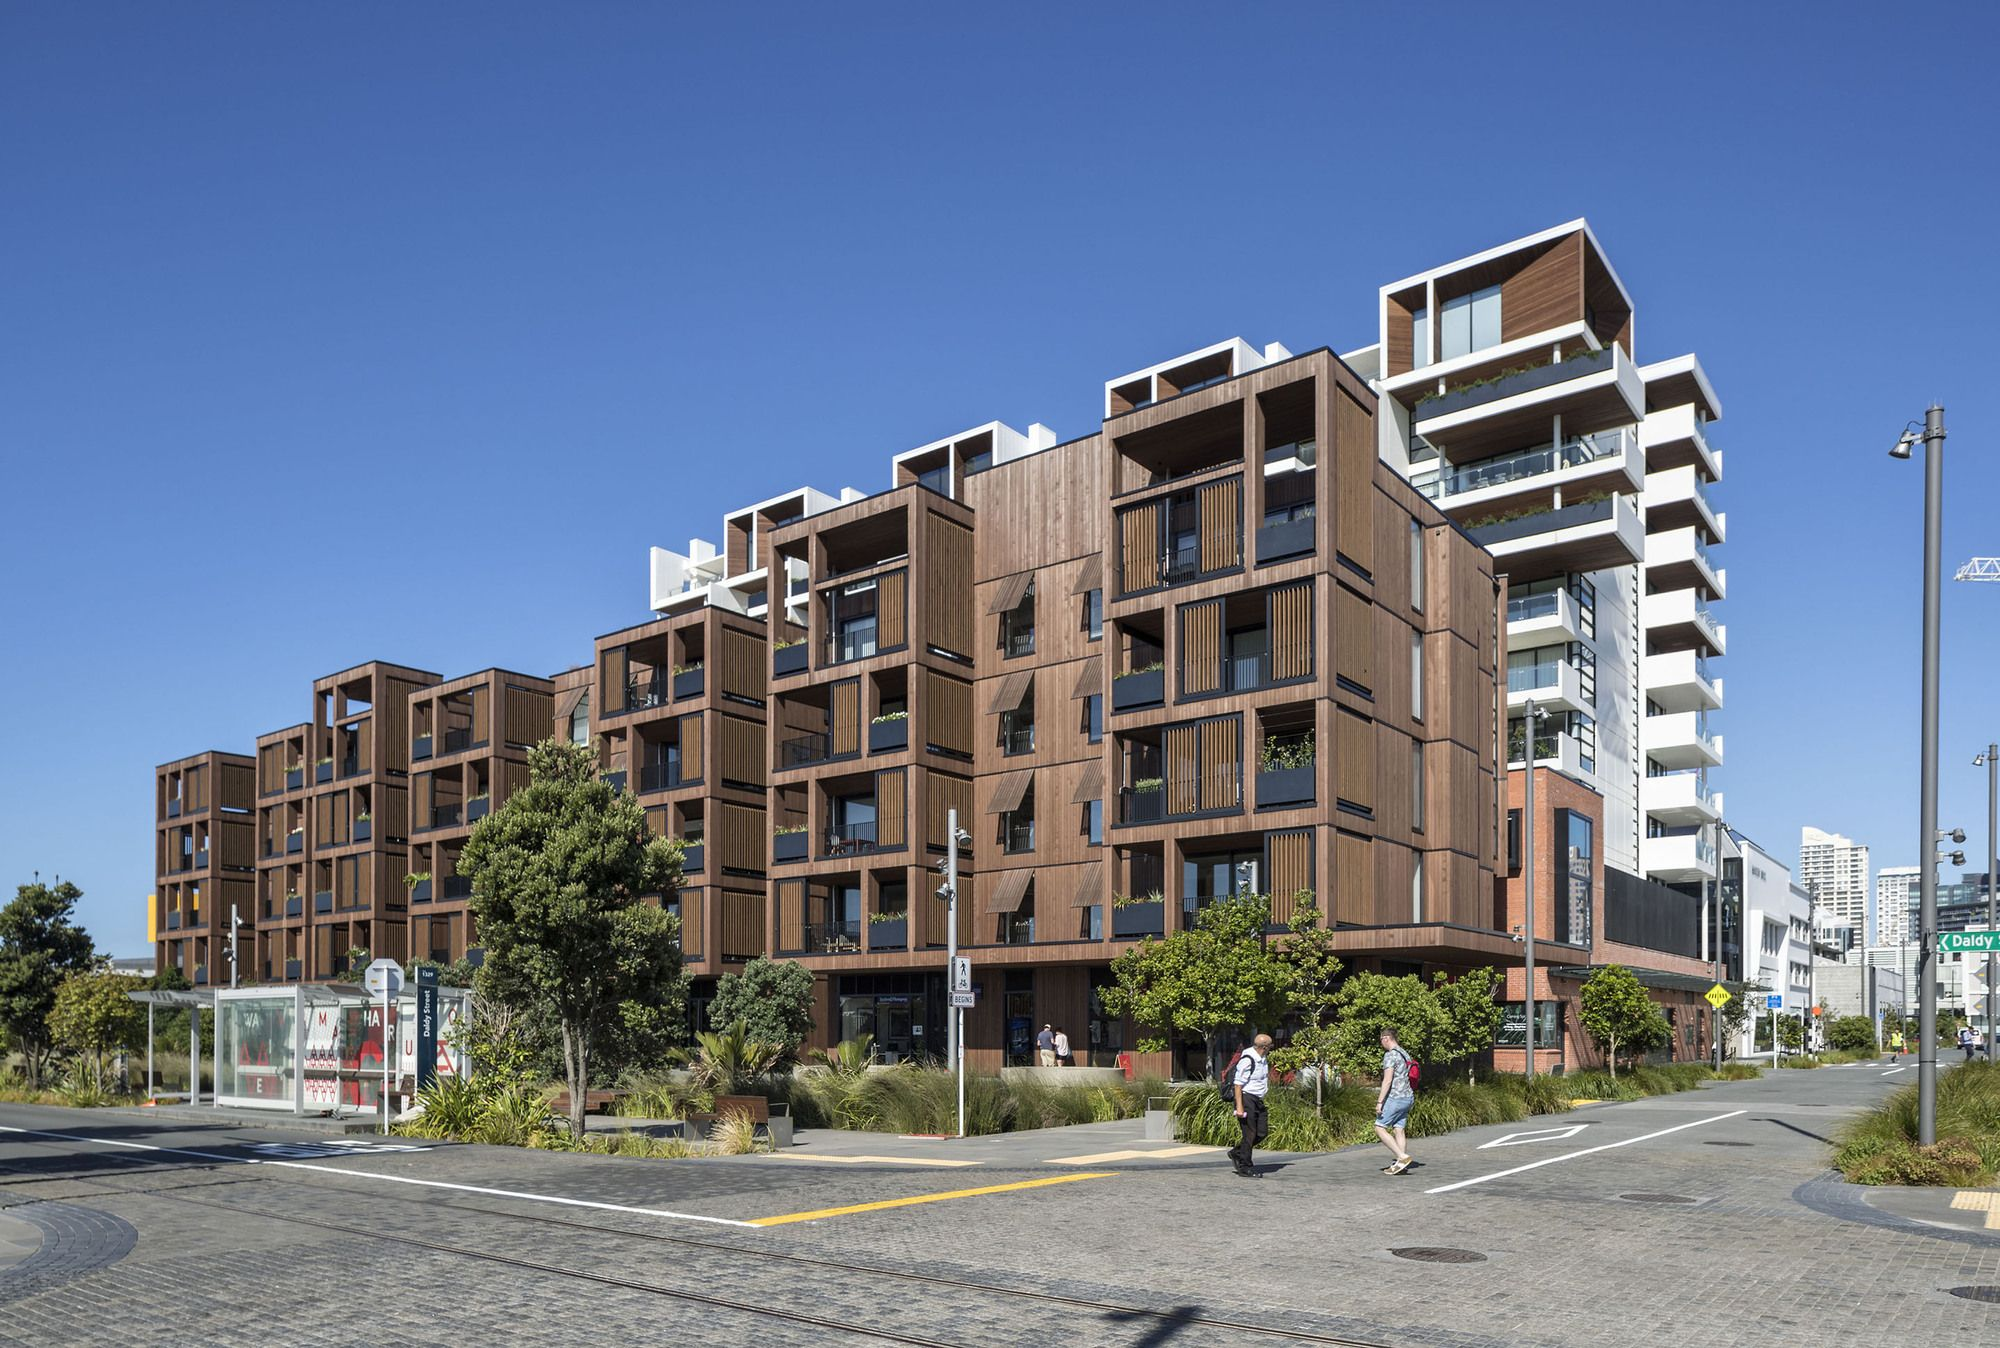 Wynyard Central East 2 Apartments Architectus New Zealand Architecture Architecture Architecture Project